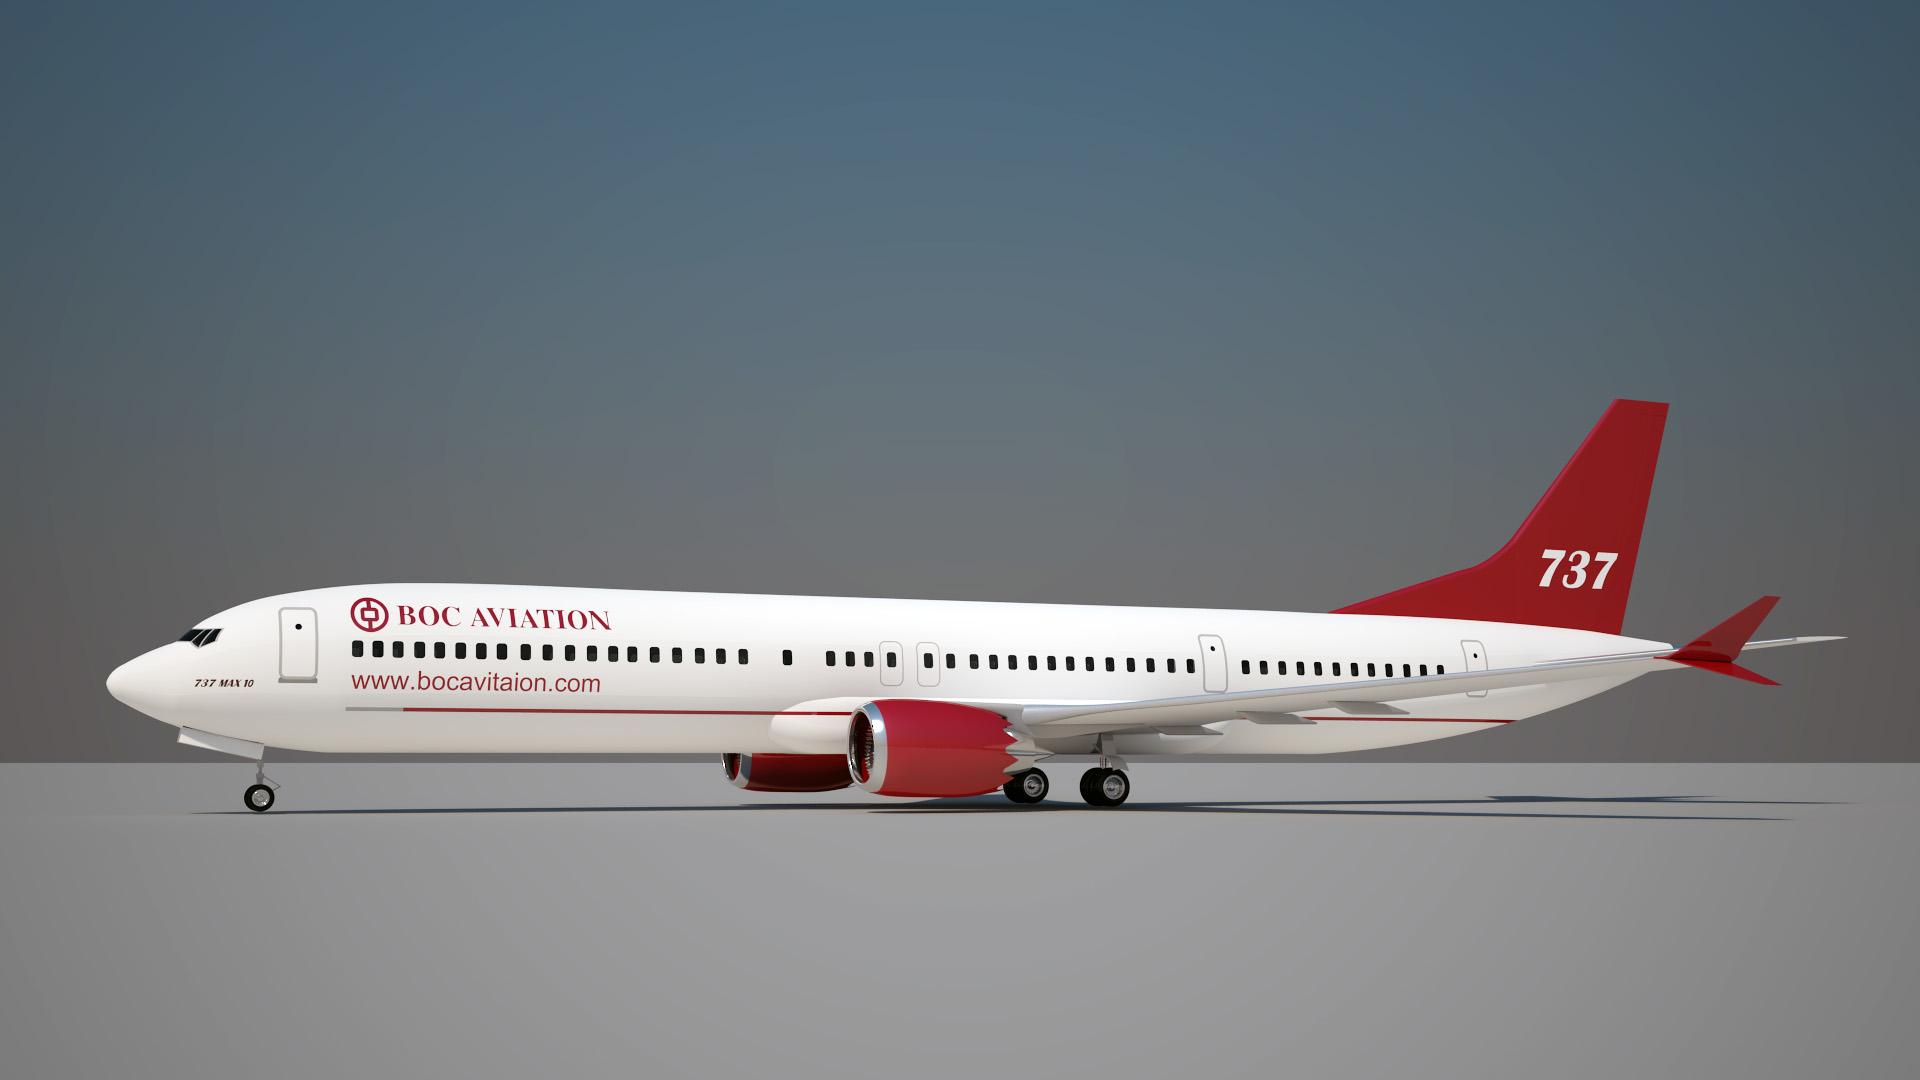 boc aviation boeing 737 3D